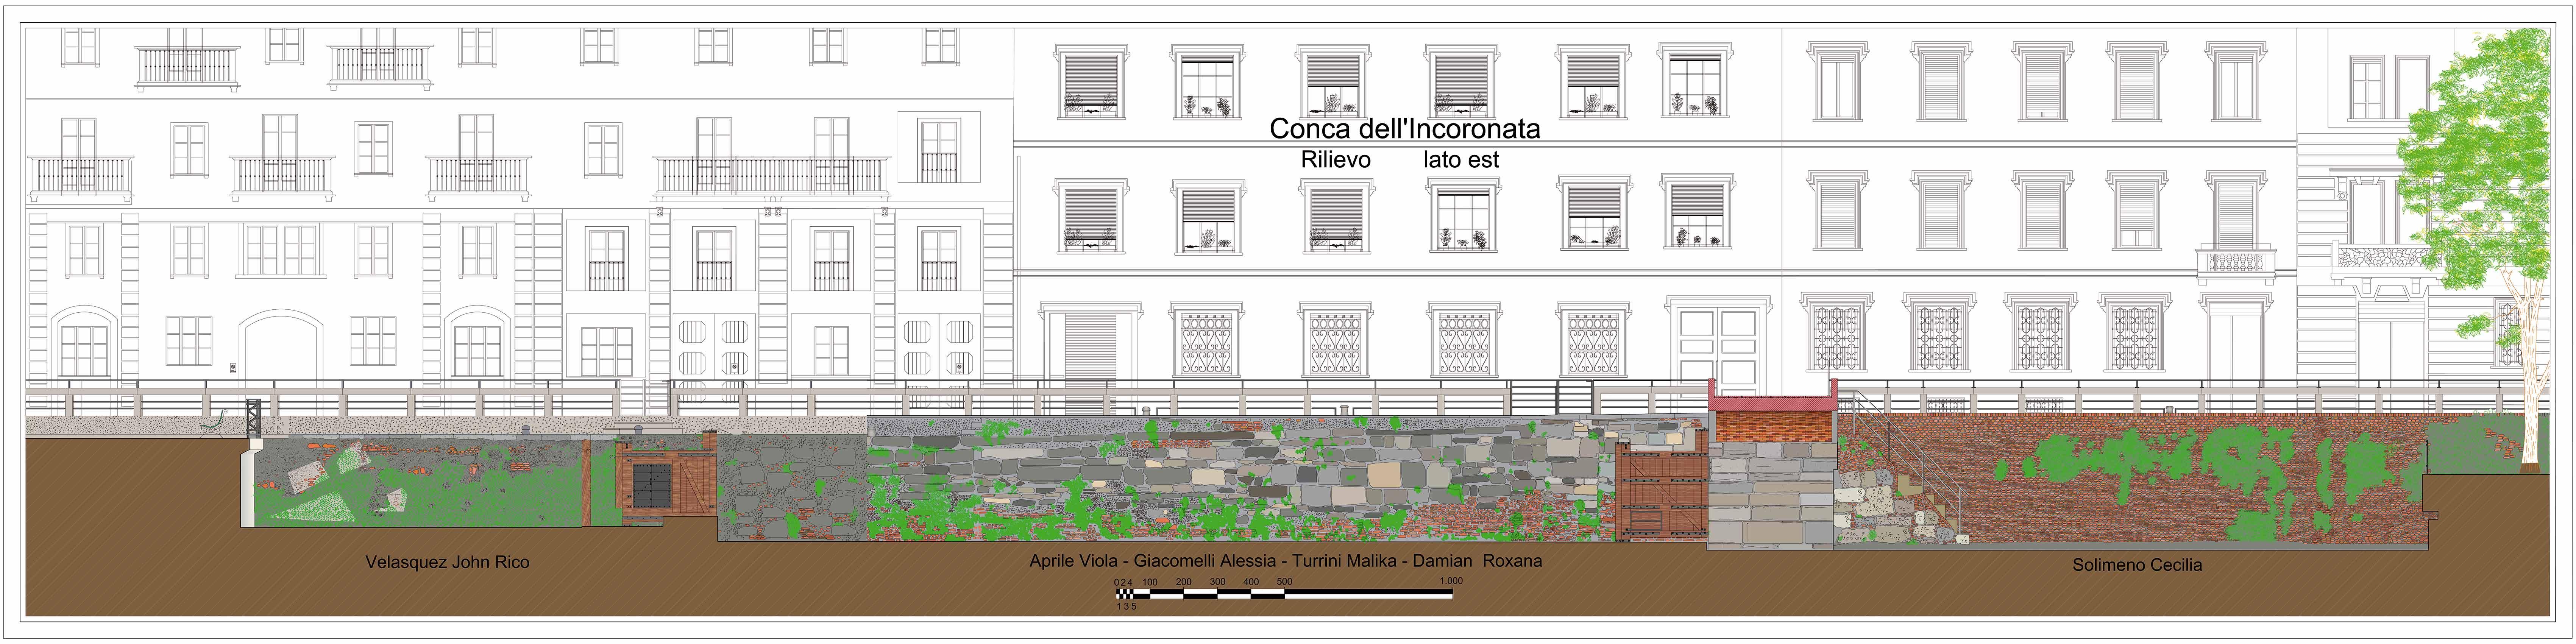 C:\001 Giuseppe\Lavori\LAS\AS16-17\5A\RilConca\Sez2 Model (1)